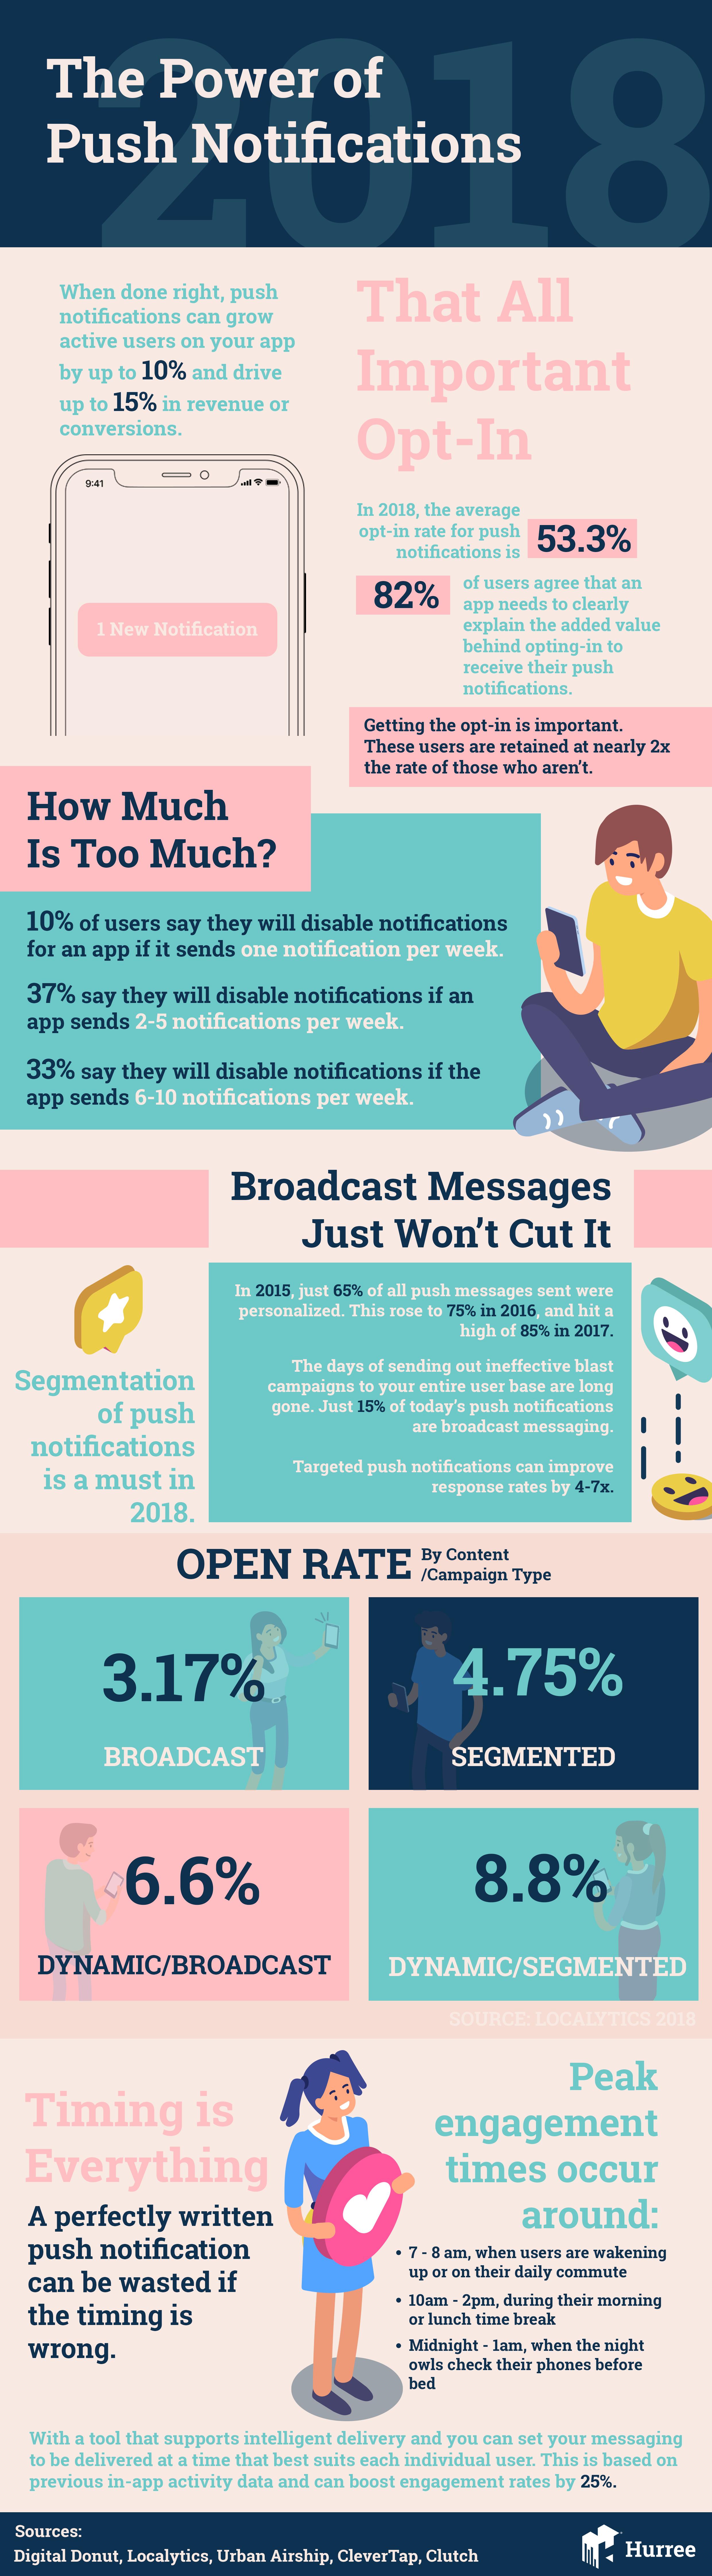 Push-Notification-Power-2018-Infographic